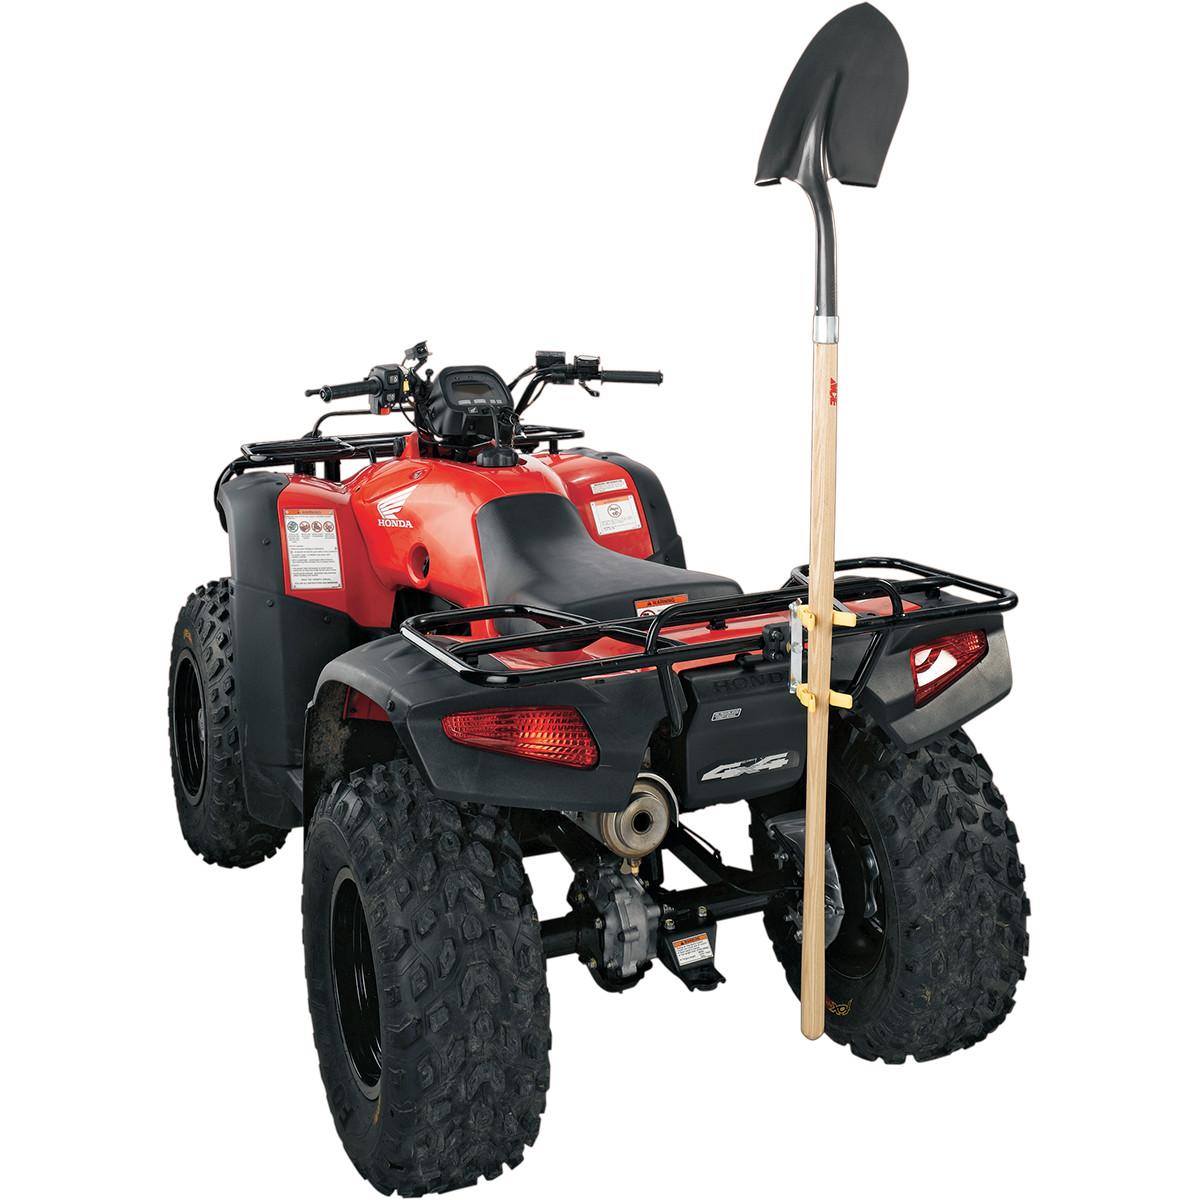 Rig your wheeler to make work easier this spring dennis for Garden tools for 4 wheeler